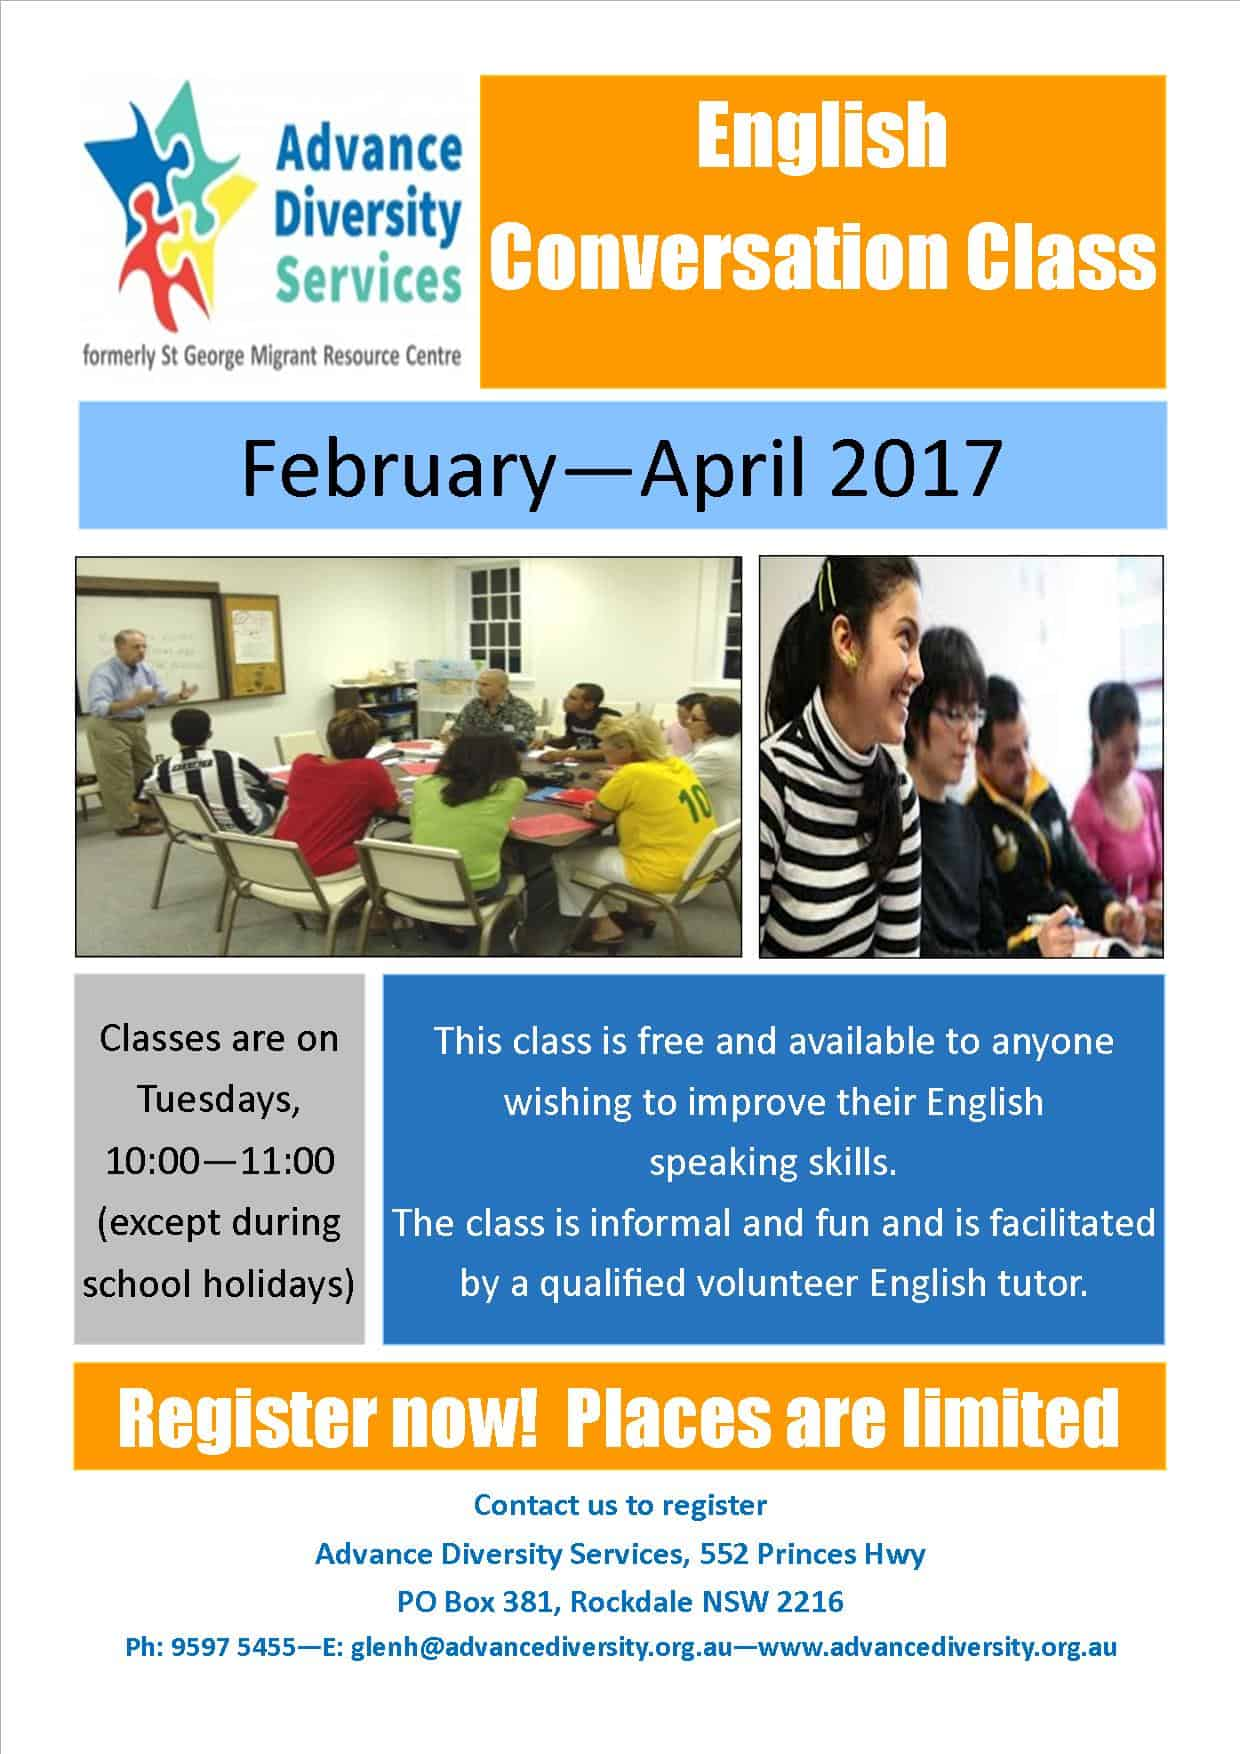 English Conversation Class | Advance Diversity